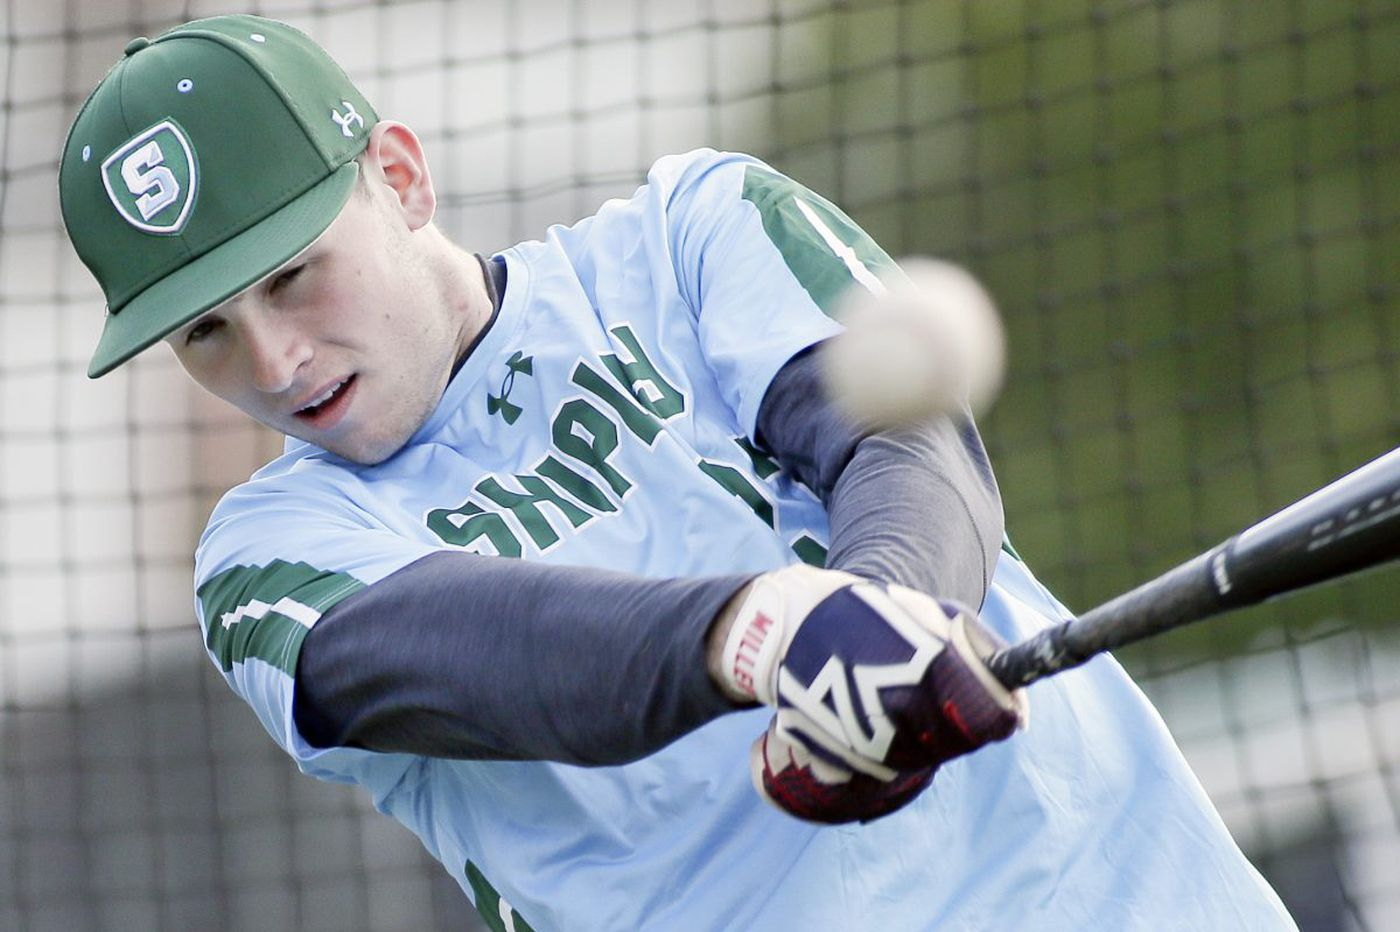 Gerard Sweeney leads talented Shipley as hard-hitting third baseman